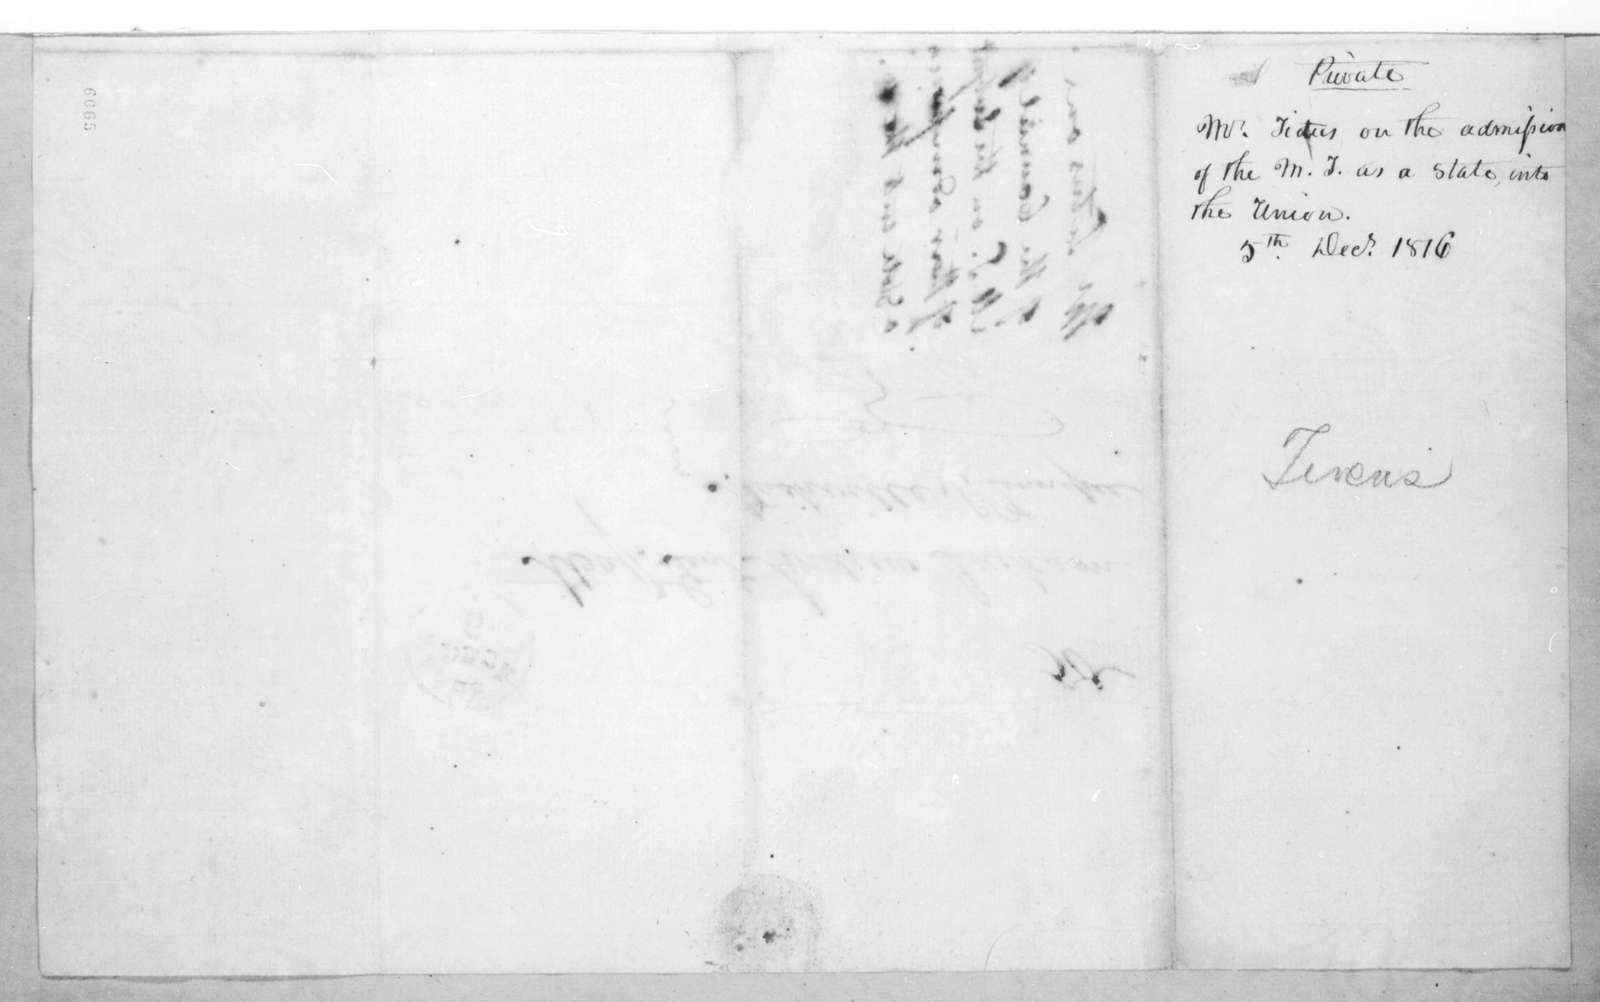 James Titus to Andrew Jackson, December 5, 1816